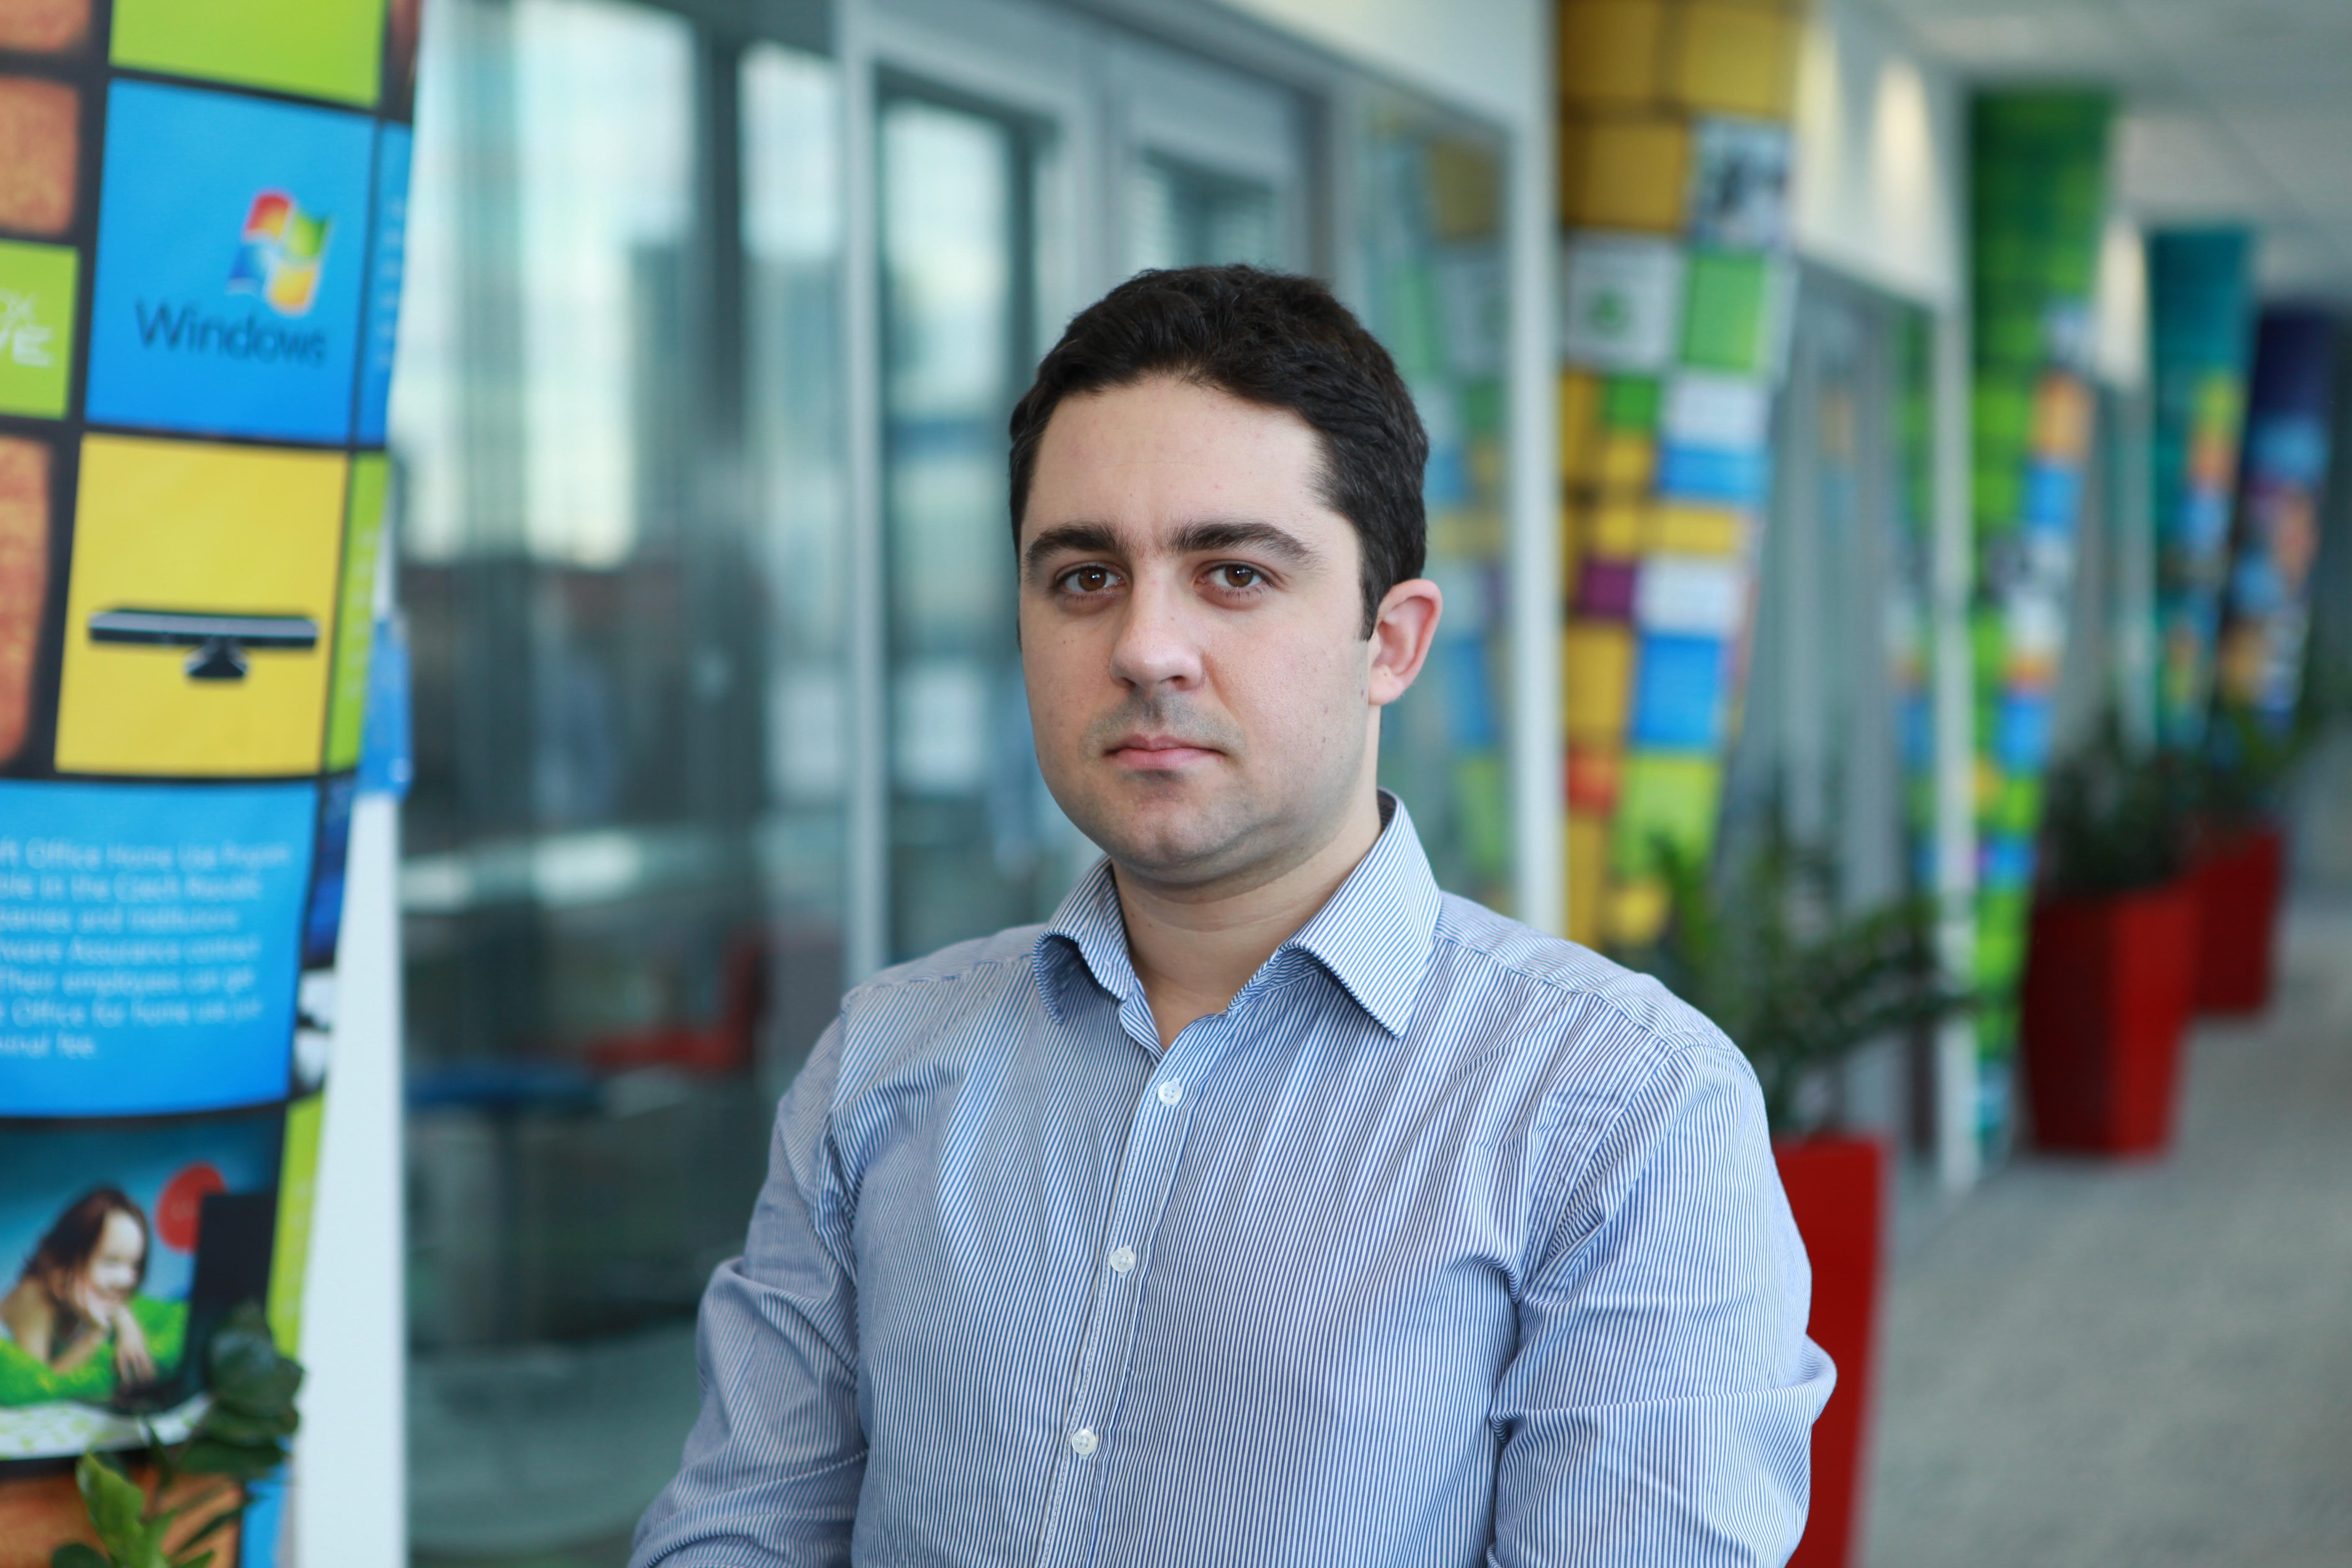 Microsoft honours Prague College student